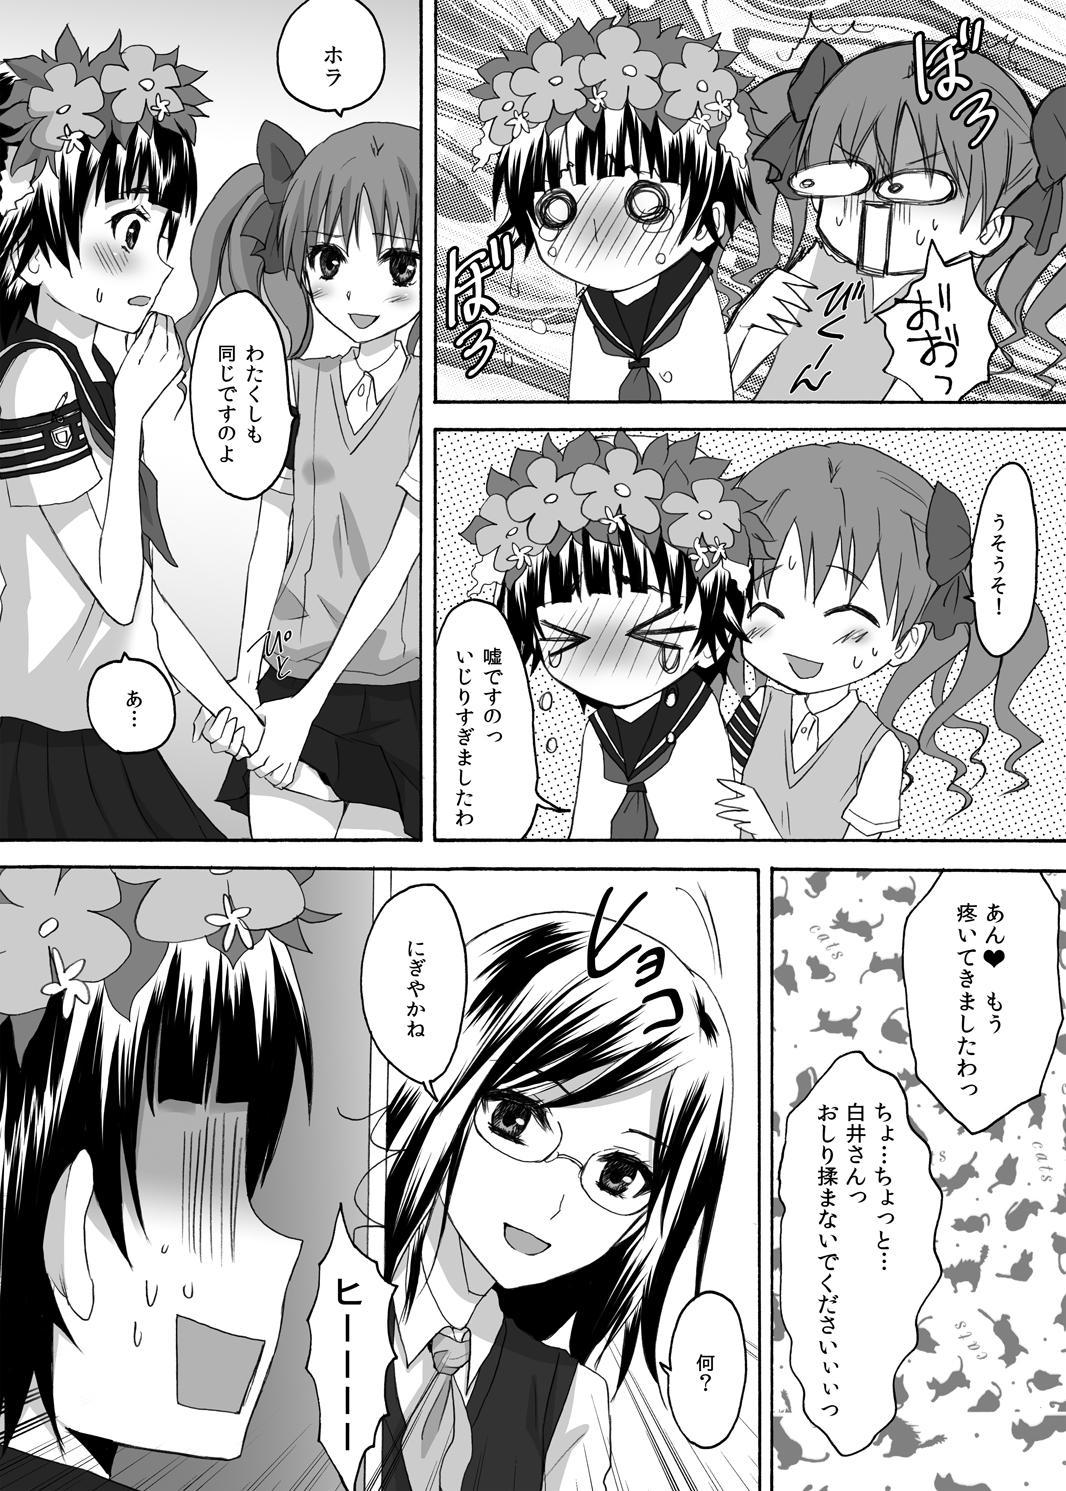 Toaru Houkago no Judgement 6